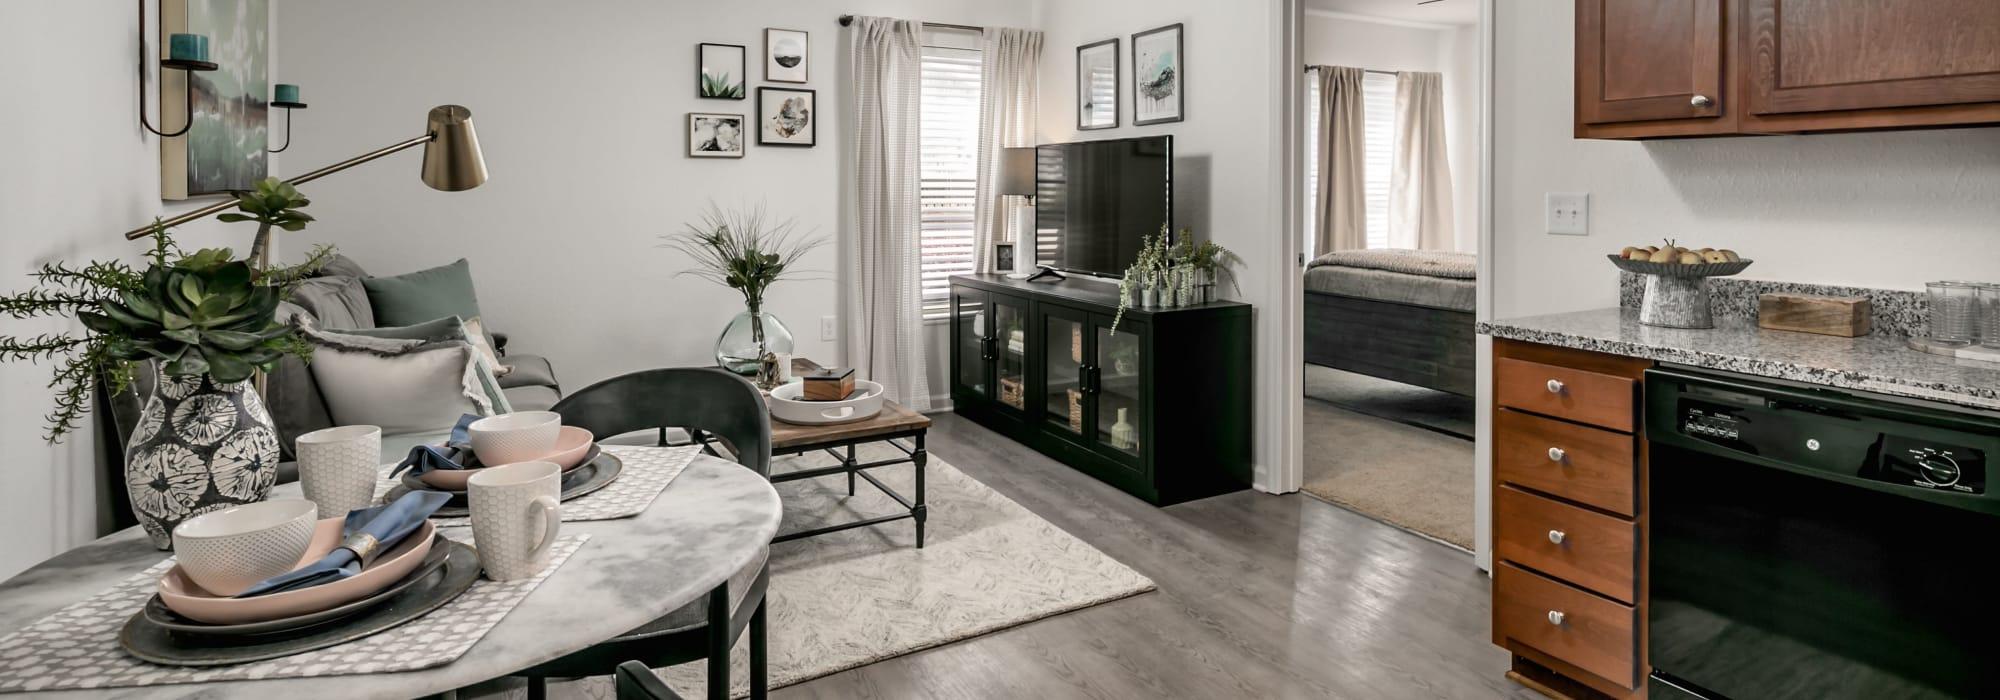 Floor plans at Landmark Apartments Hattiesburg